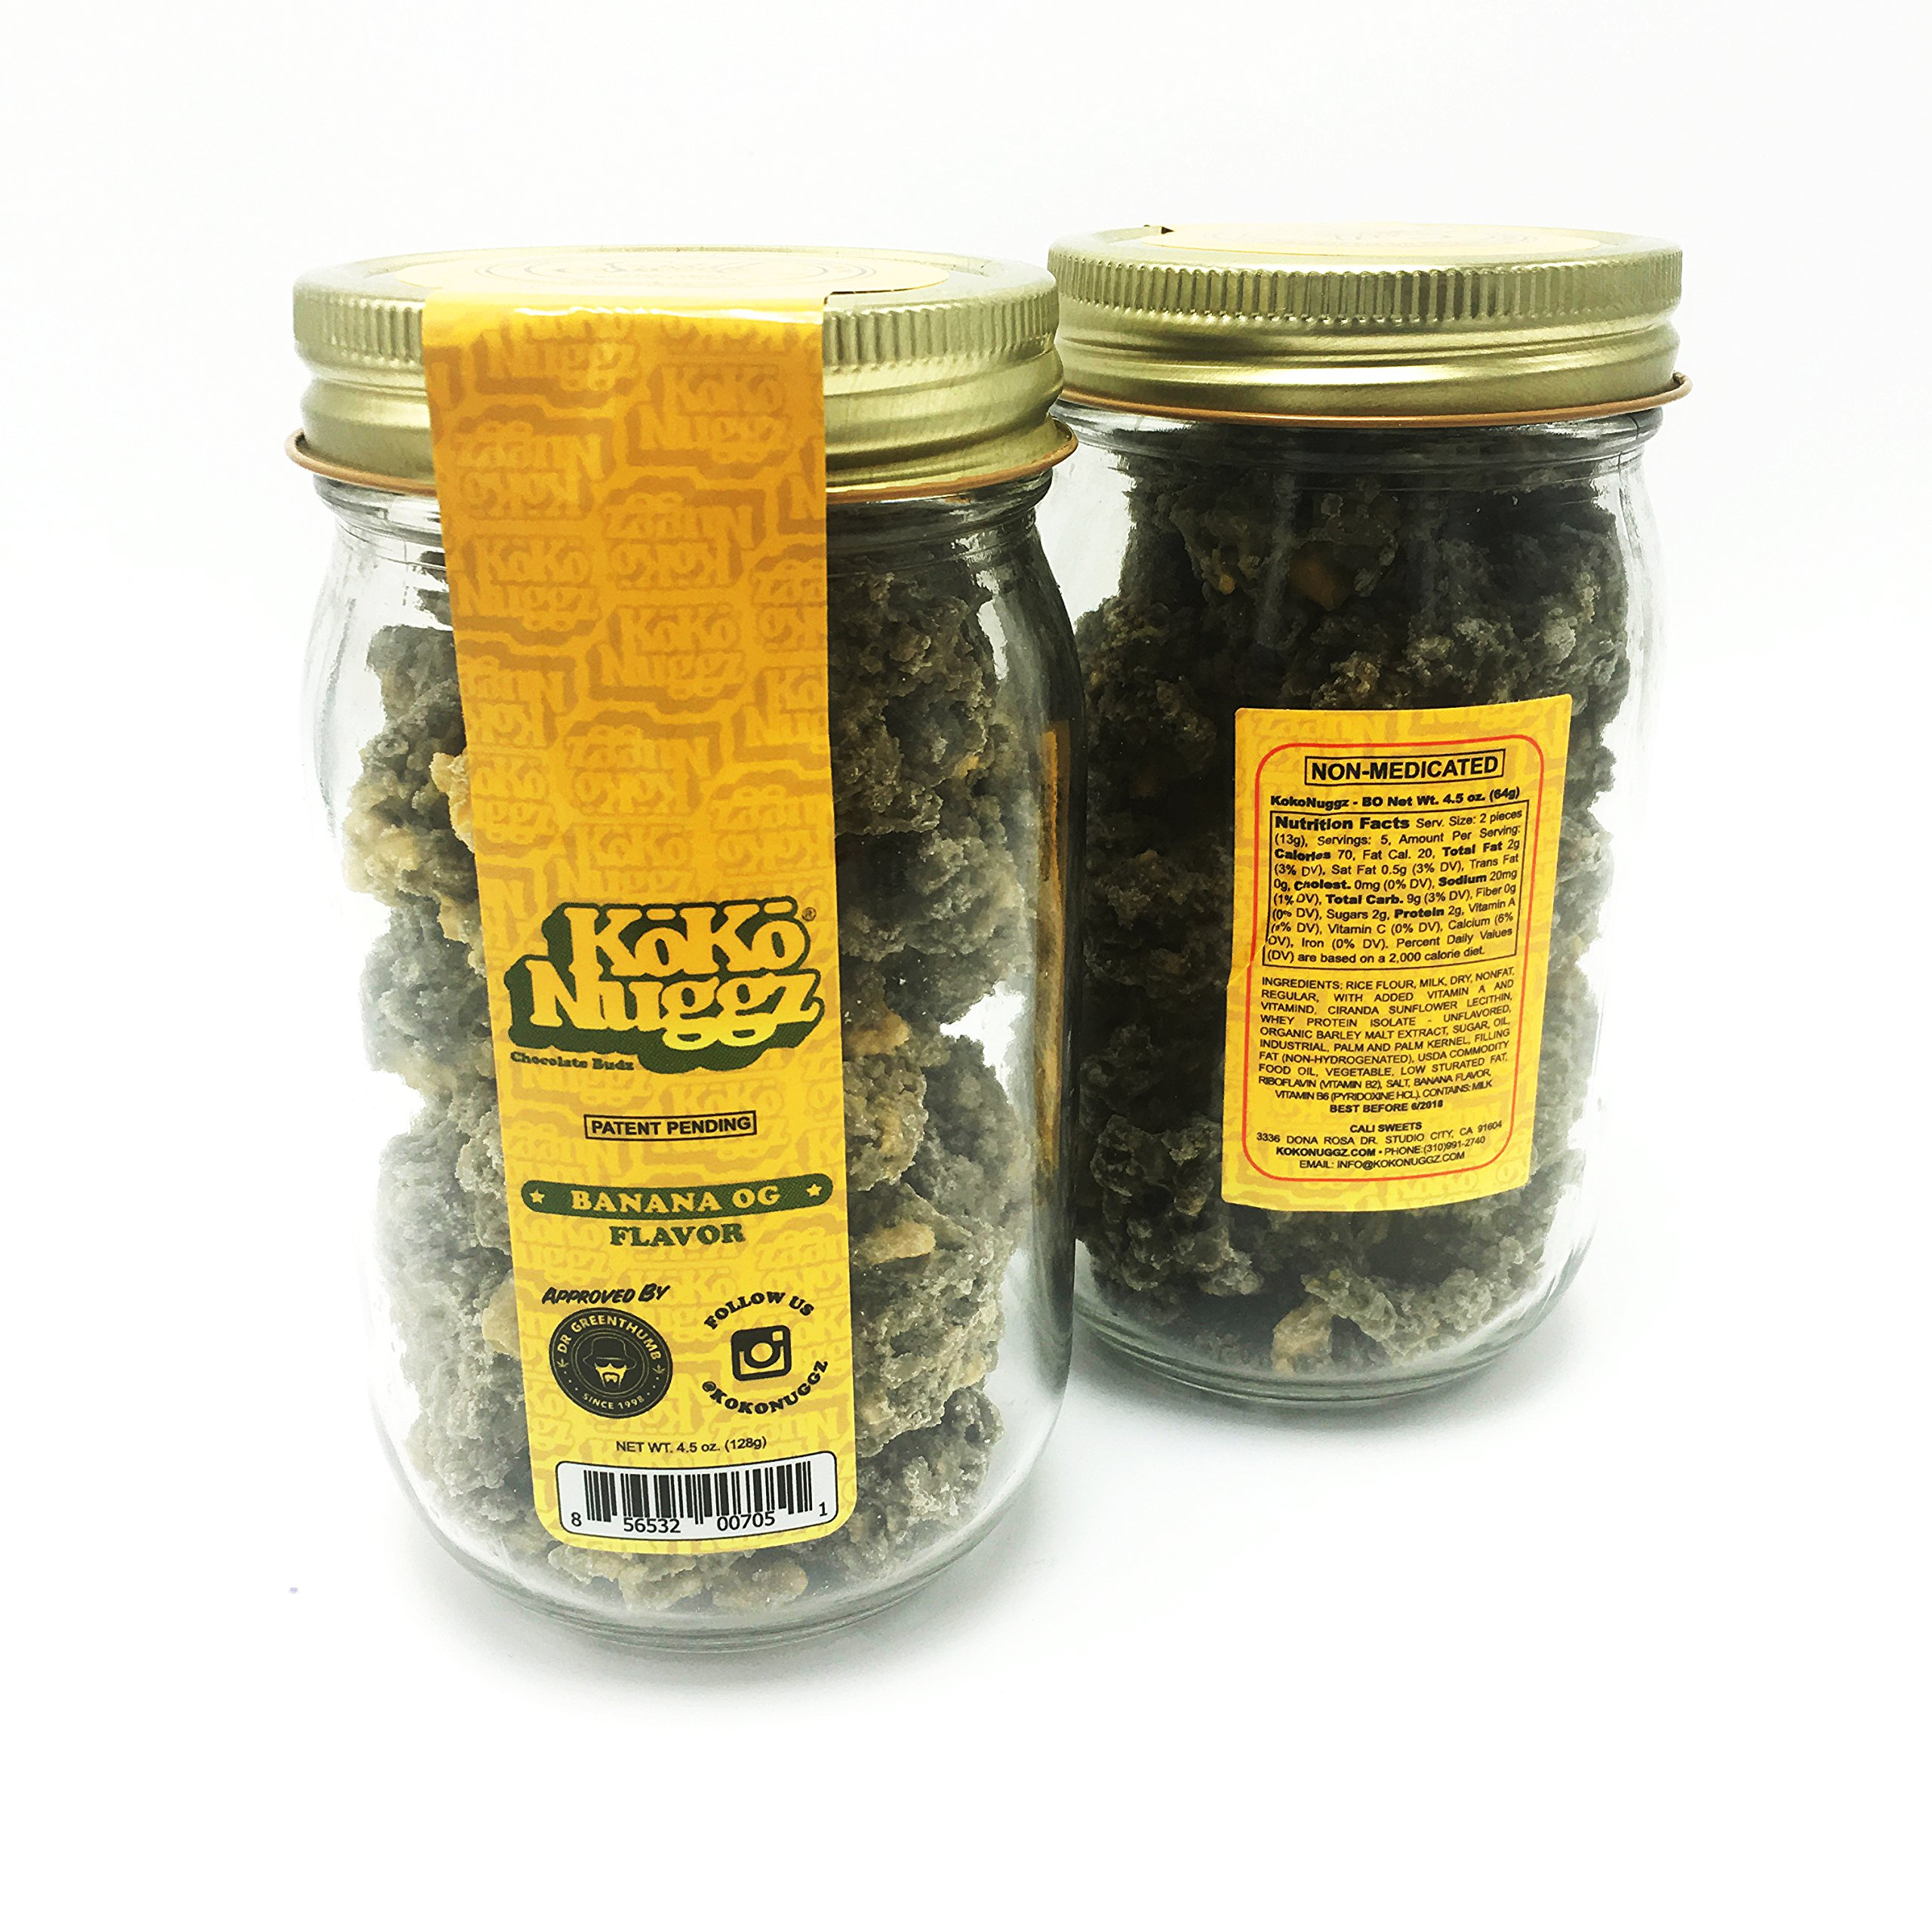 Koko Nuggz Flavor Chocolate Non Medicated BIG JAR (15 oz ) (Banana OG) by Koko Nuggz